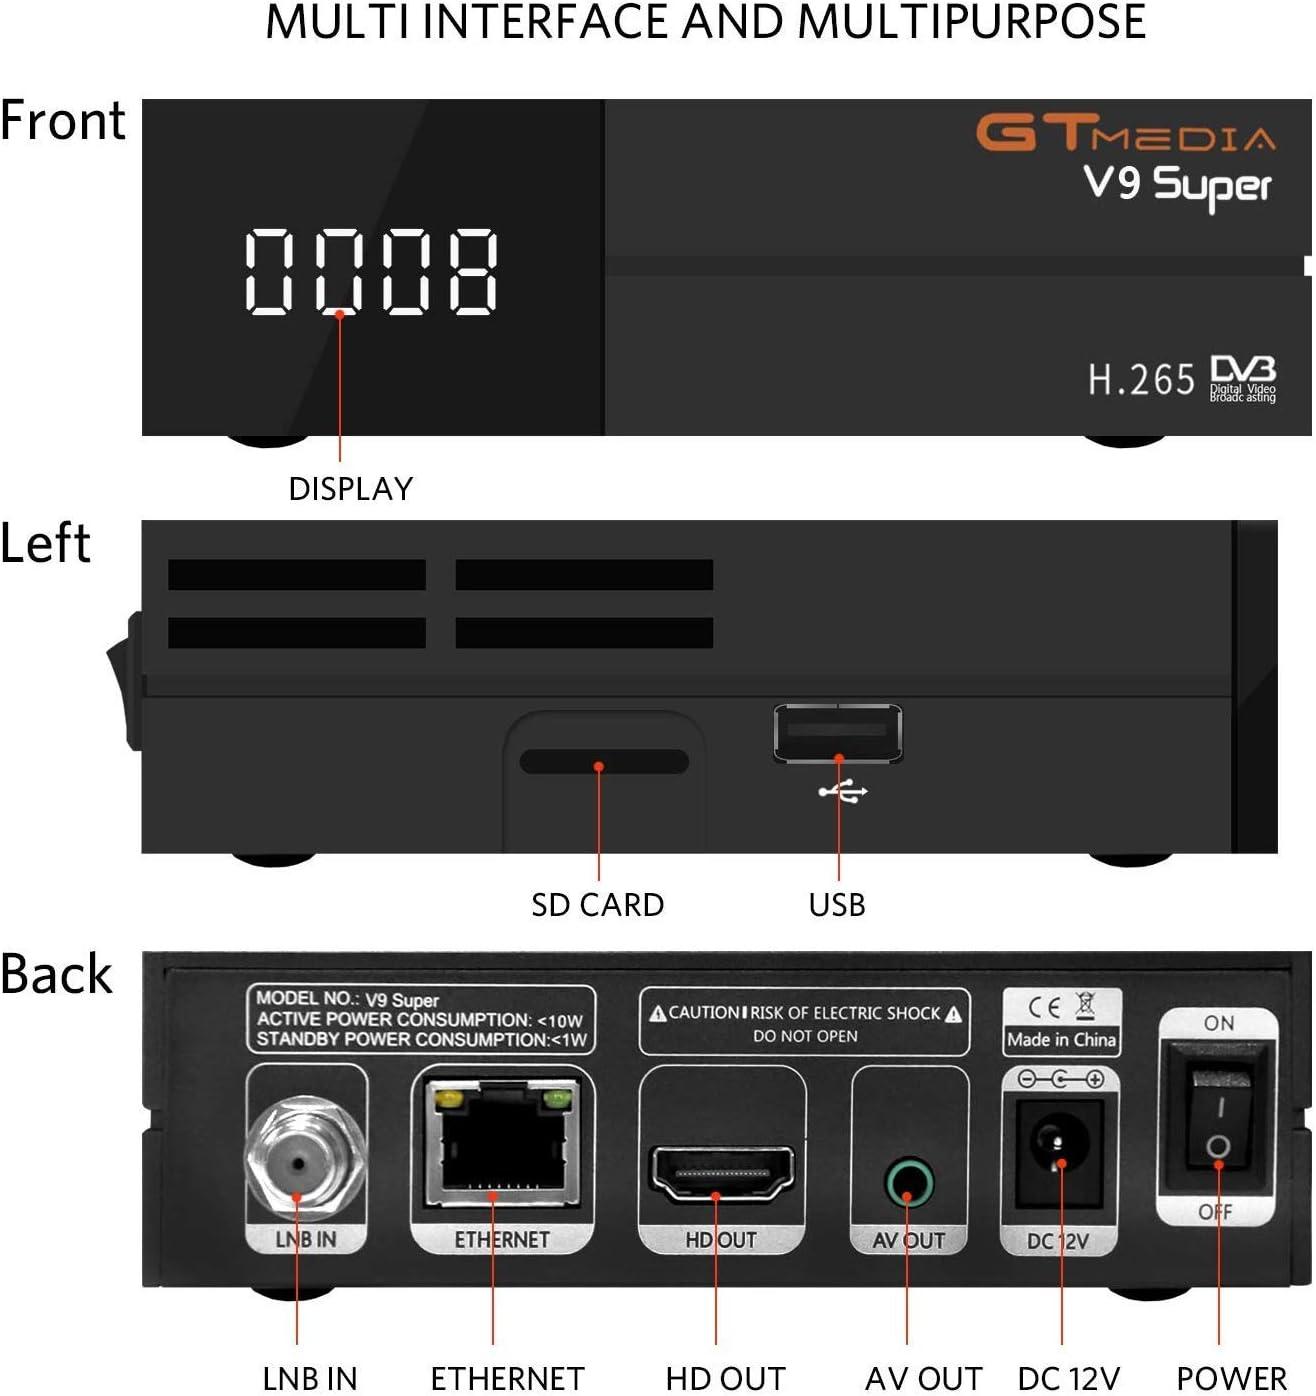 GT MEDIA V9 Super DVB S2 Satelite Ricevitore Decodificador Oficial Freesat Digital TV Sat Receptor Soporte H.265 1080P Full HD CCcam Newcam IPTV Youtube PVR PowerVu Biss chiave, con WiFi Incorporado: Amazon.es: